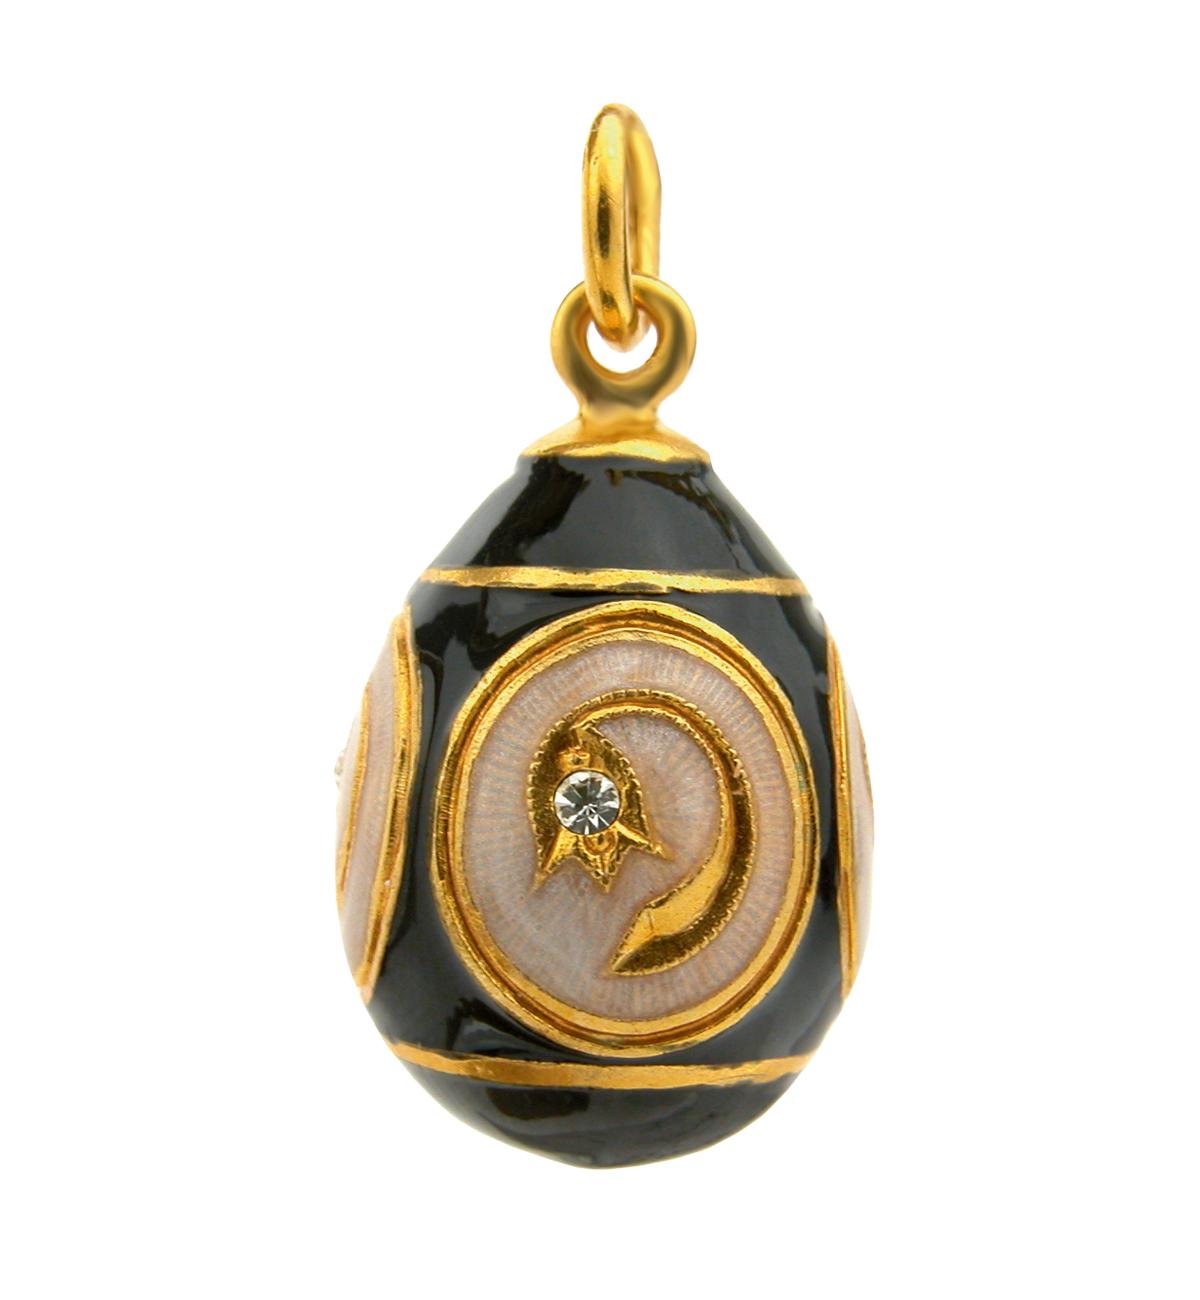 : - Fabergéägg-svart med guld